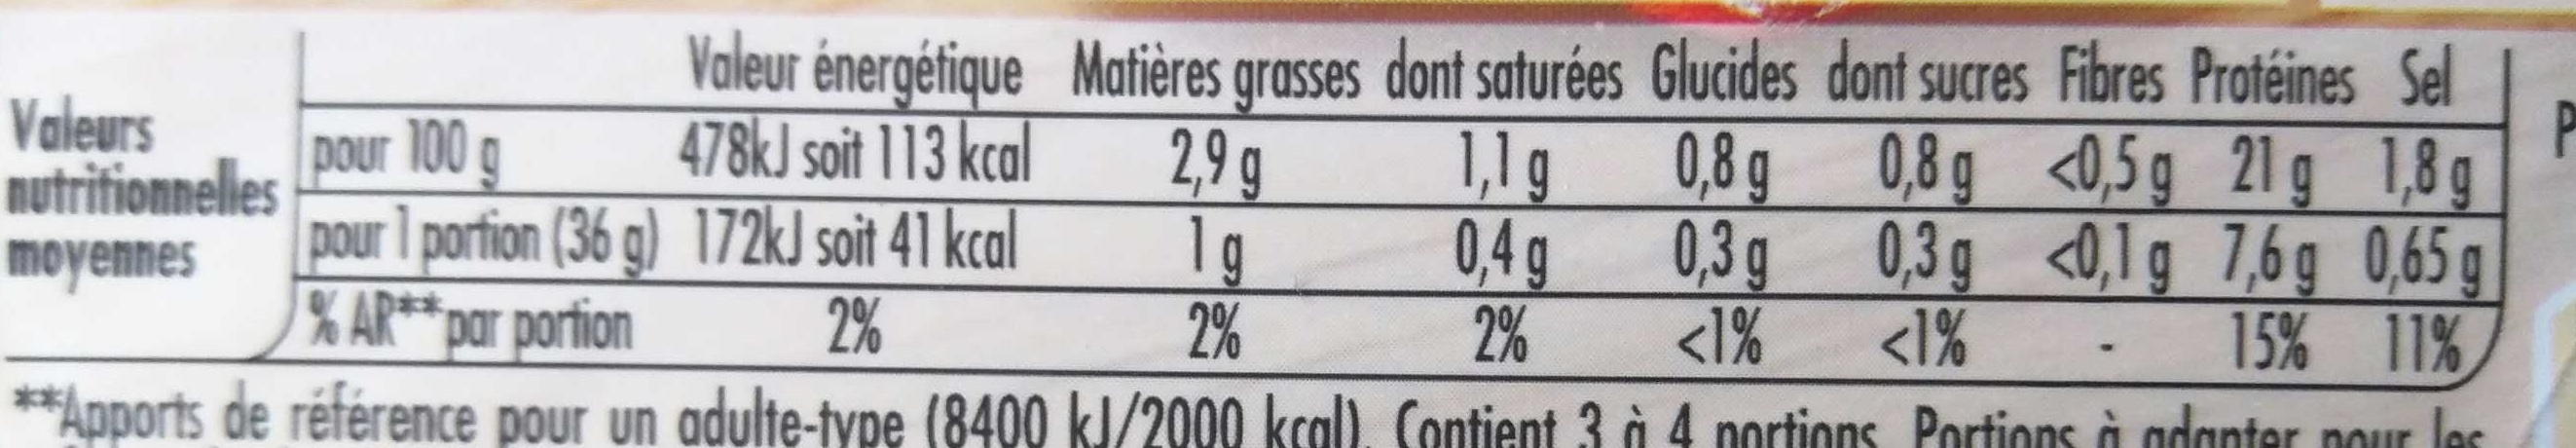 Bacon fumé - Nutrition facts